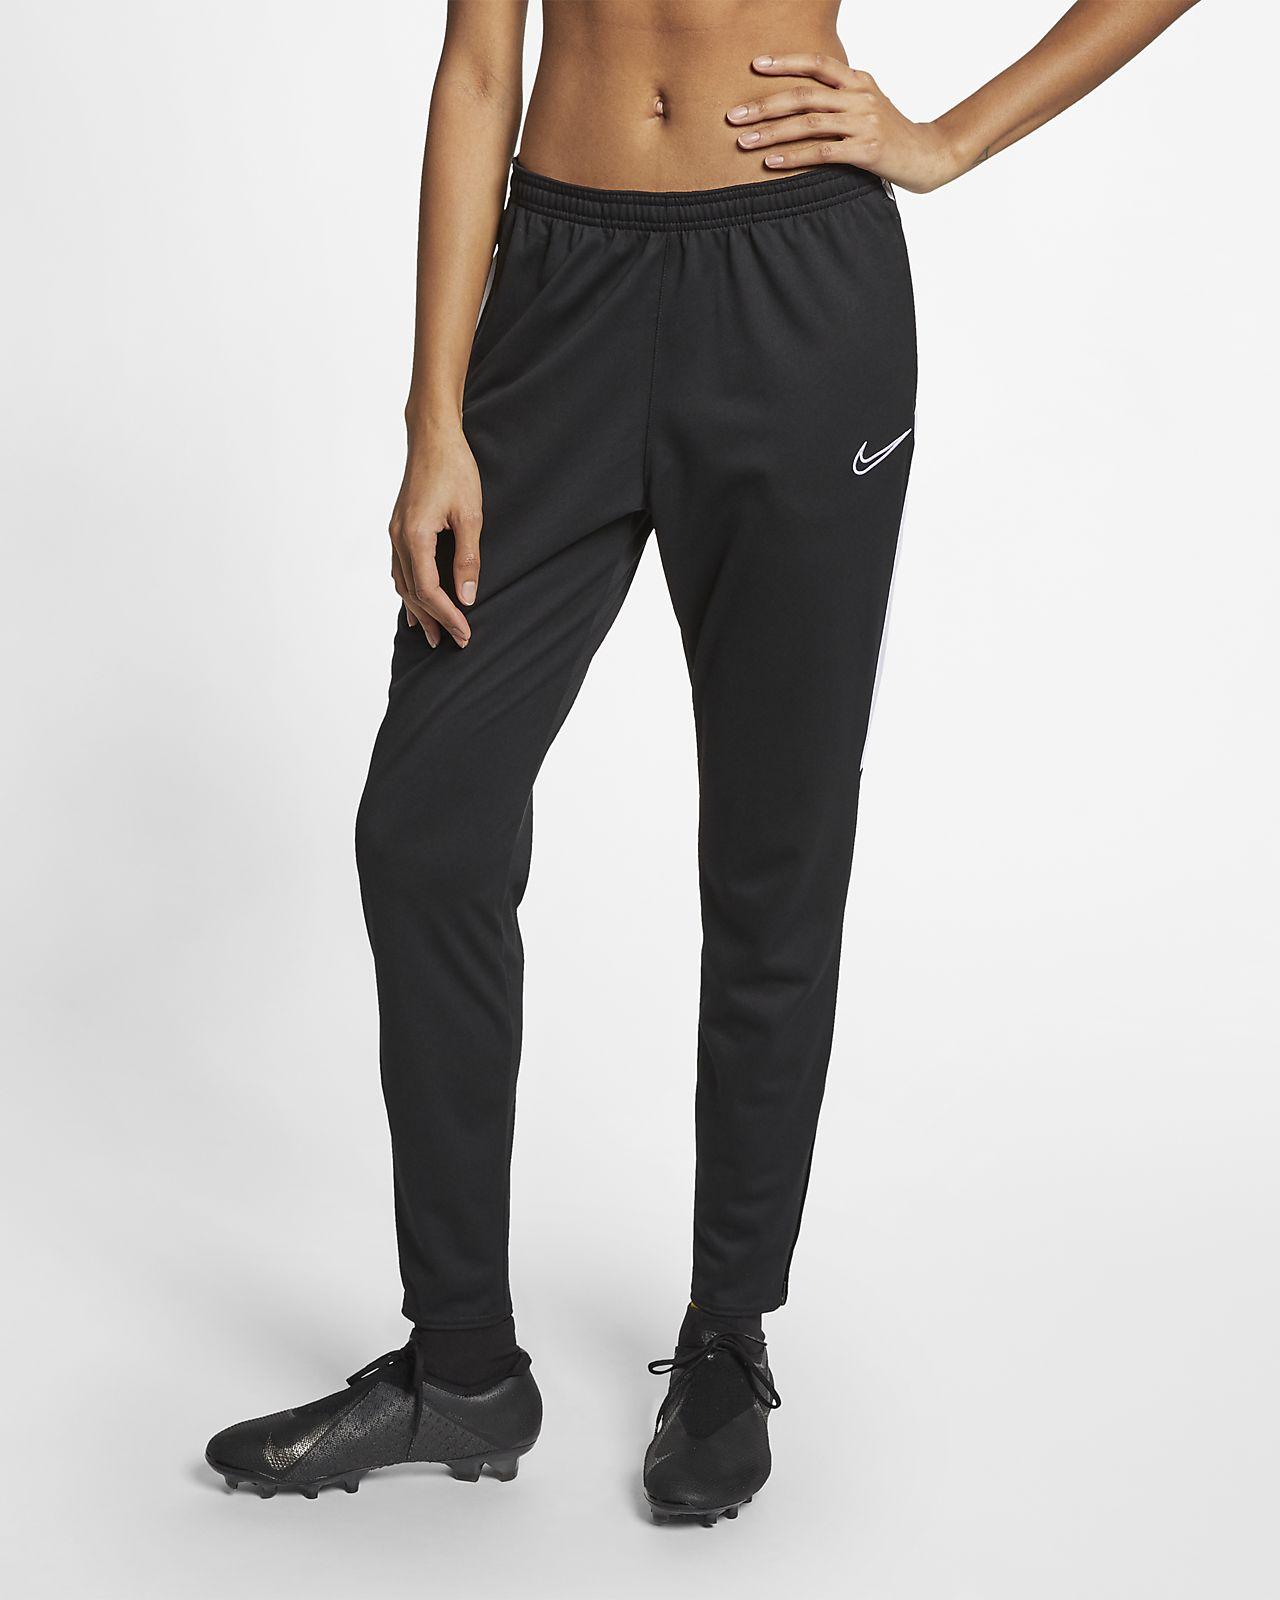 Nike Dri FIT Academy Voetbalbroek voor dames